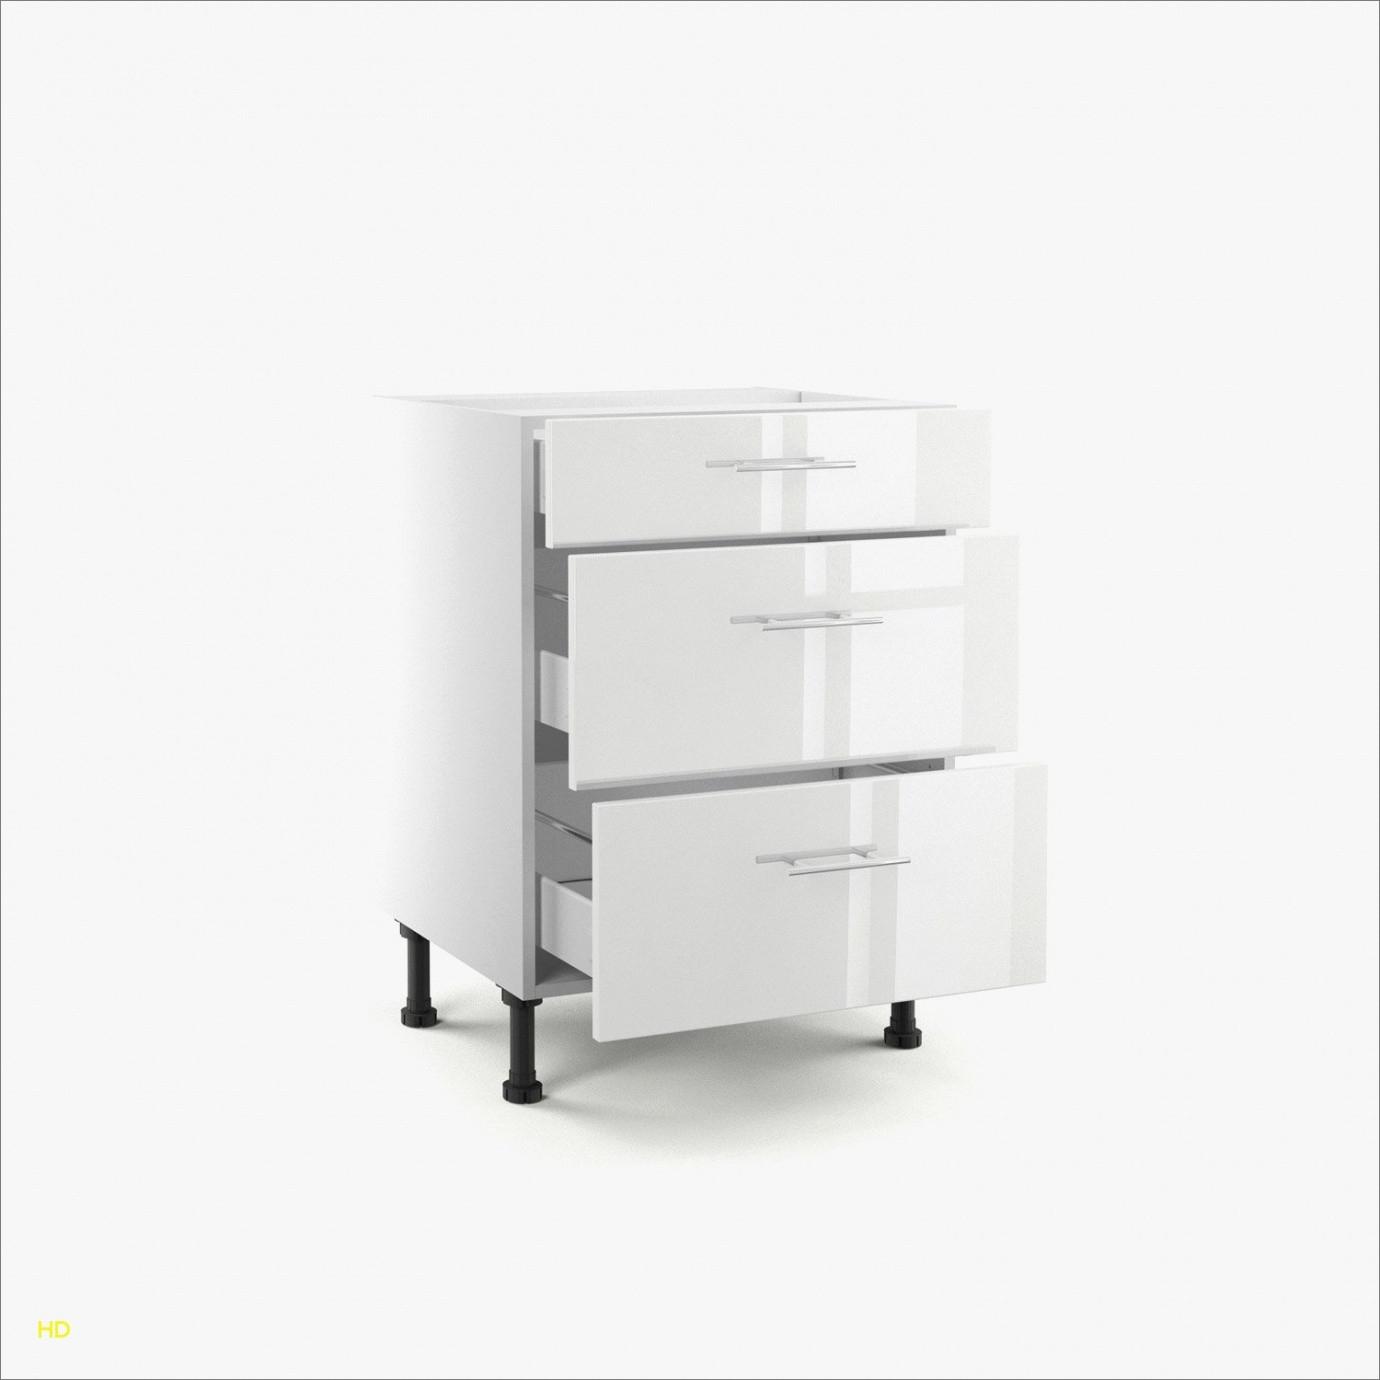 Meuble 30 Cm Profondeur Rpc Meuble Bas Cuisine 50 Cm intérieur Meuble Bas Cuisine 50 Cm Largeur Ikea